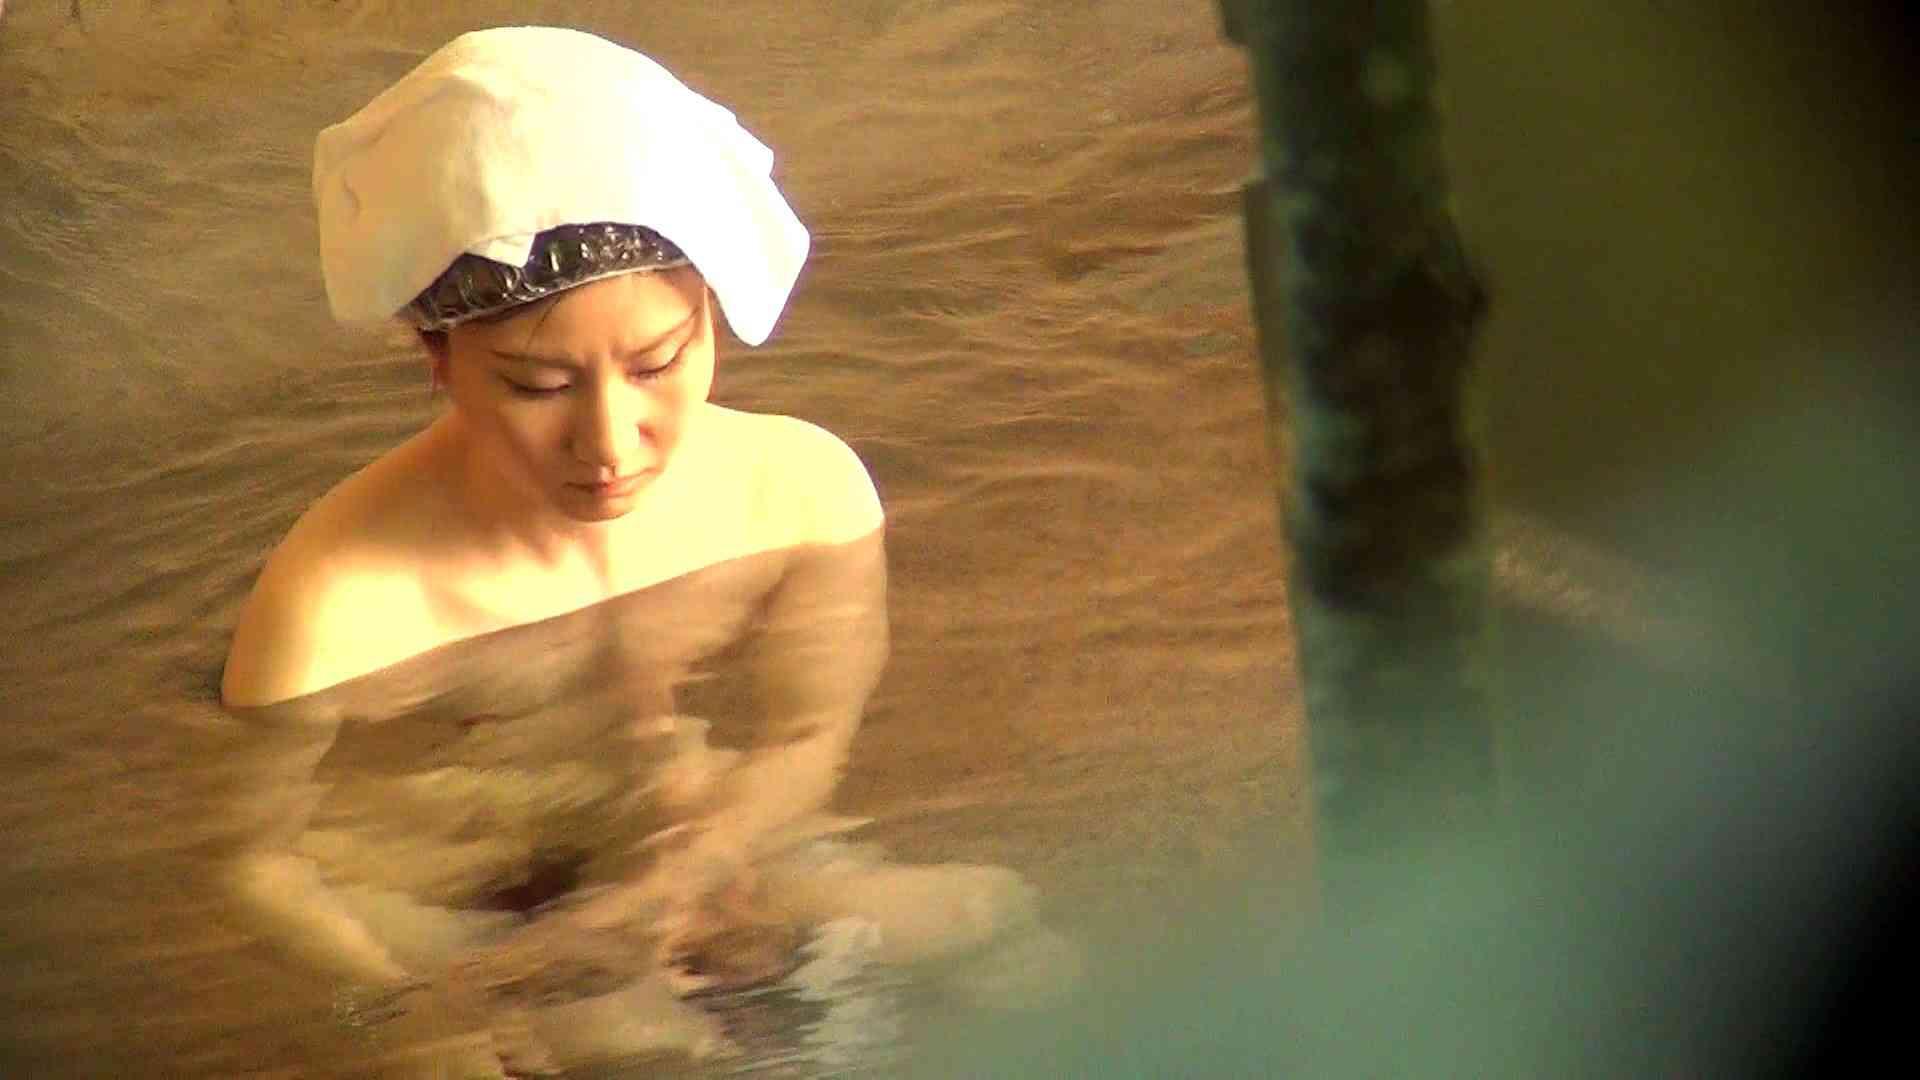 Aquaな露天風呂Vol.278 盗撮シリーズ | 露天風呂編  100PIX 79